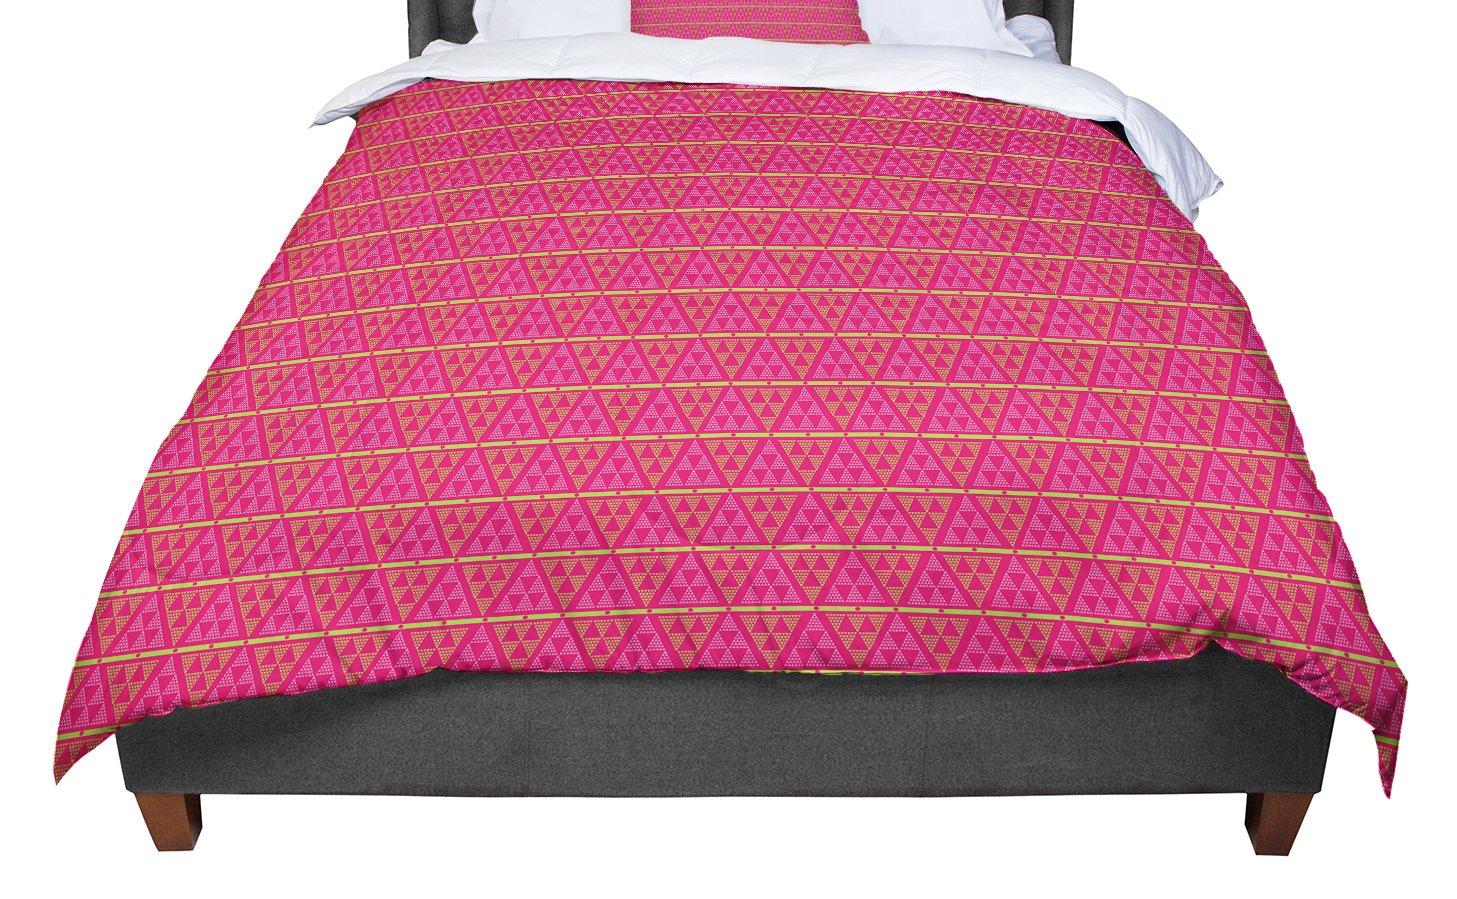 Kess InHouse Julie Hamilton Woven Red Pink Bed Runner